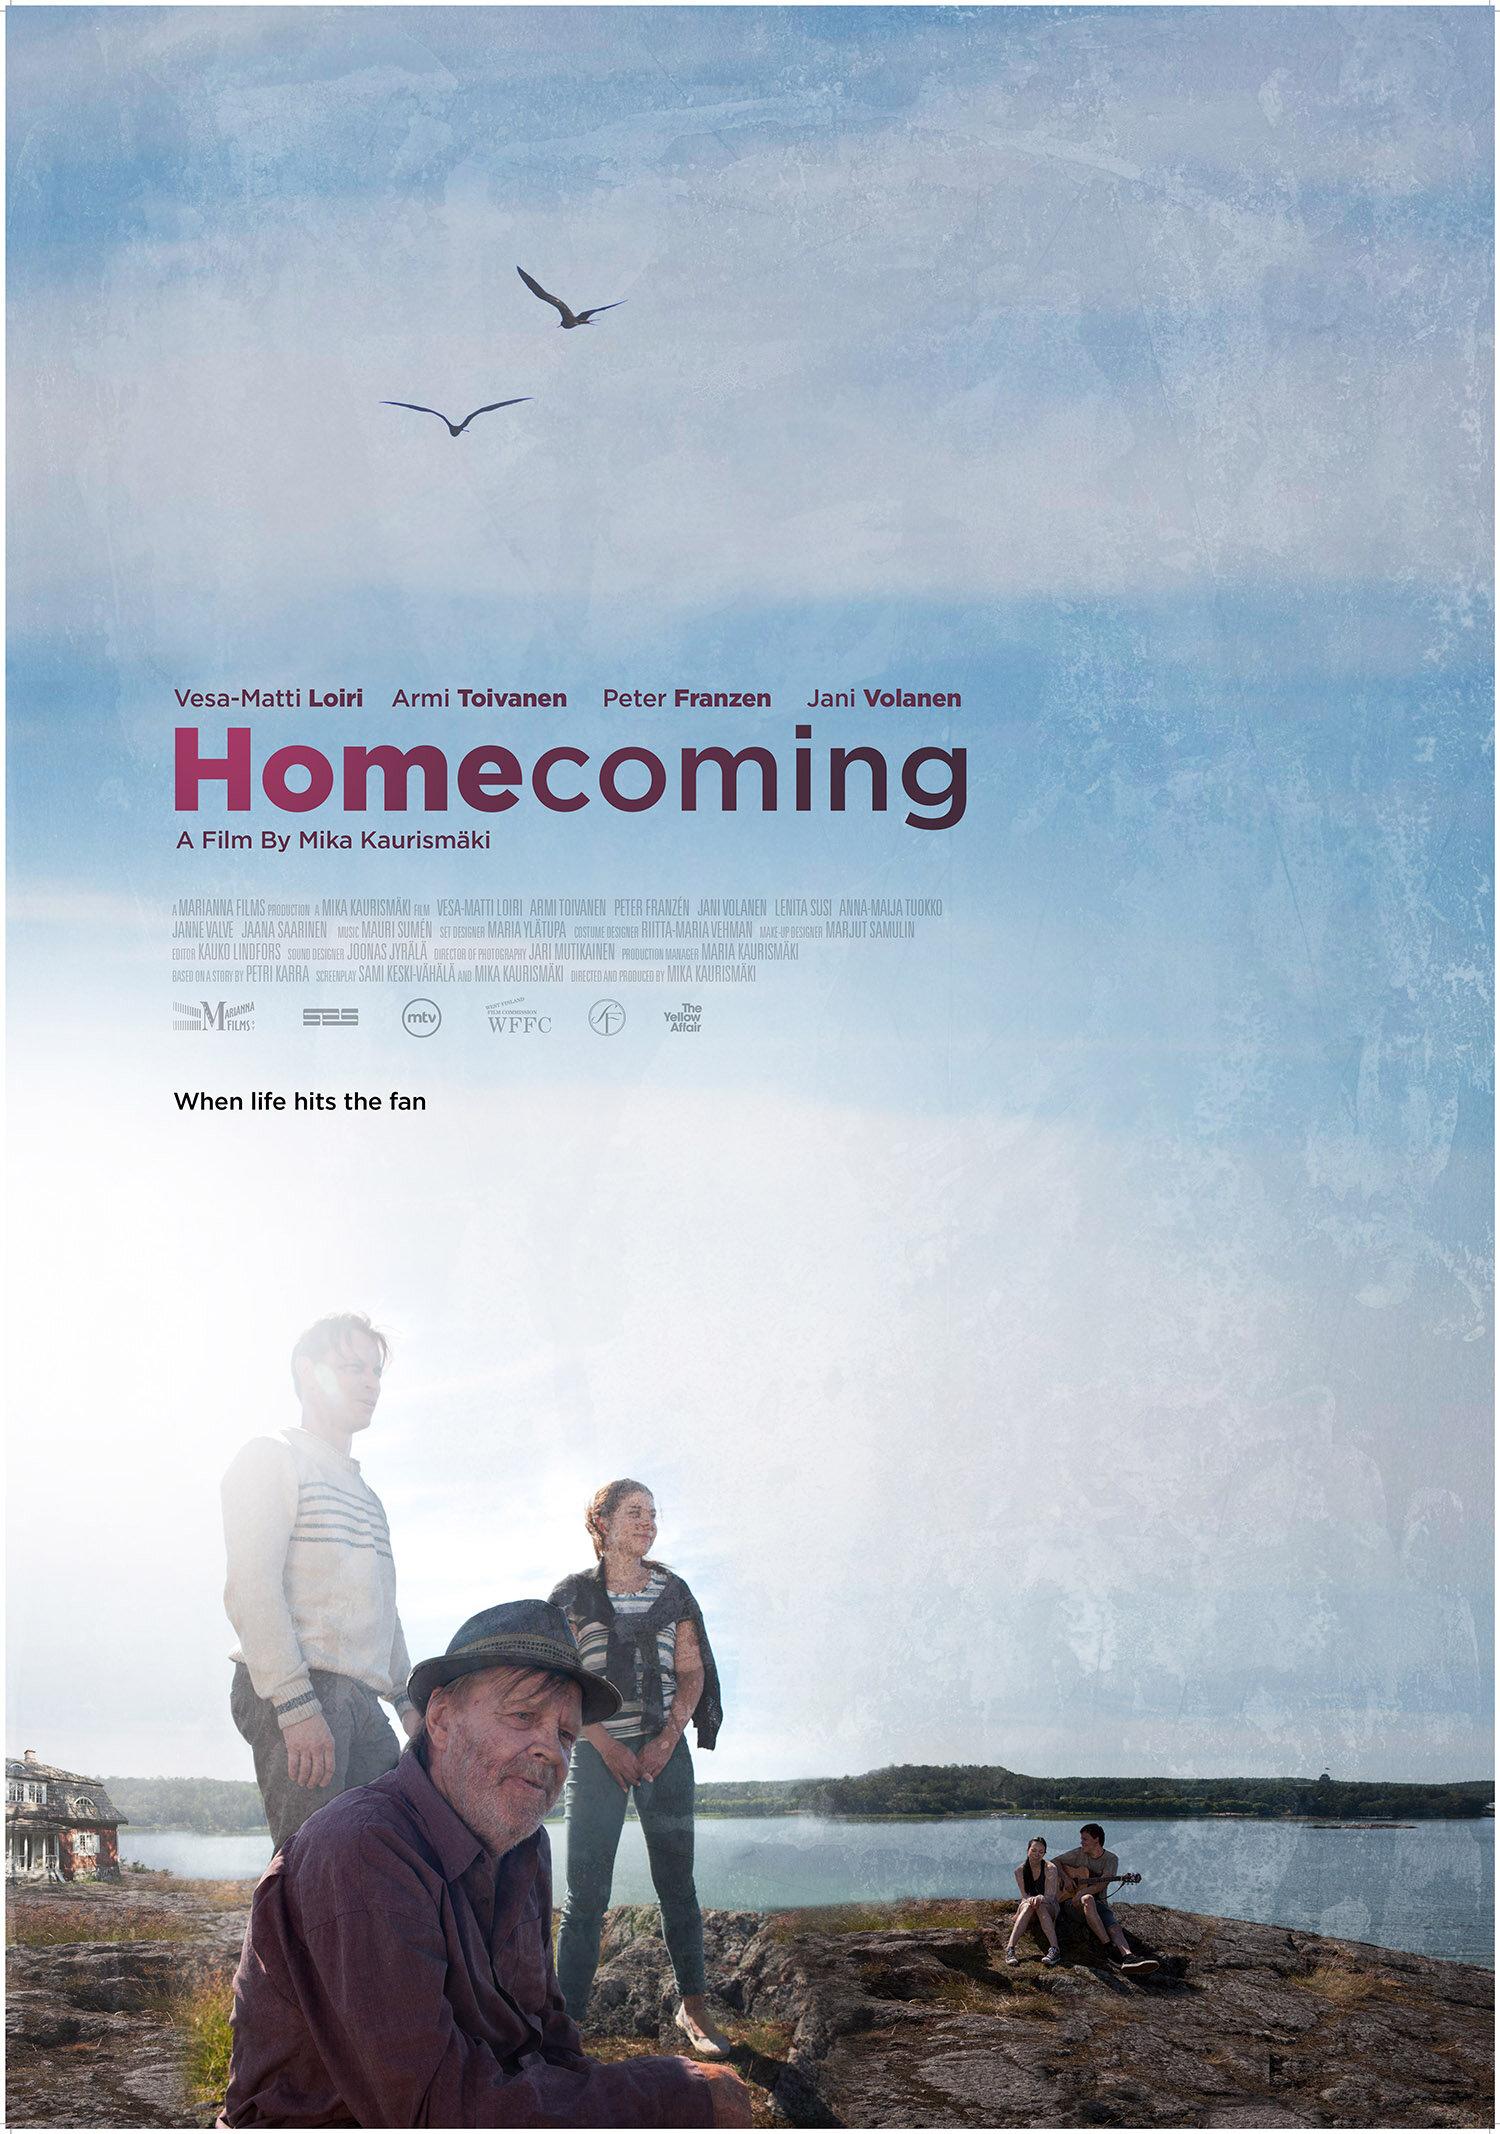 Homecoming_70x100_kjs08.jpeg